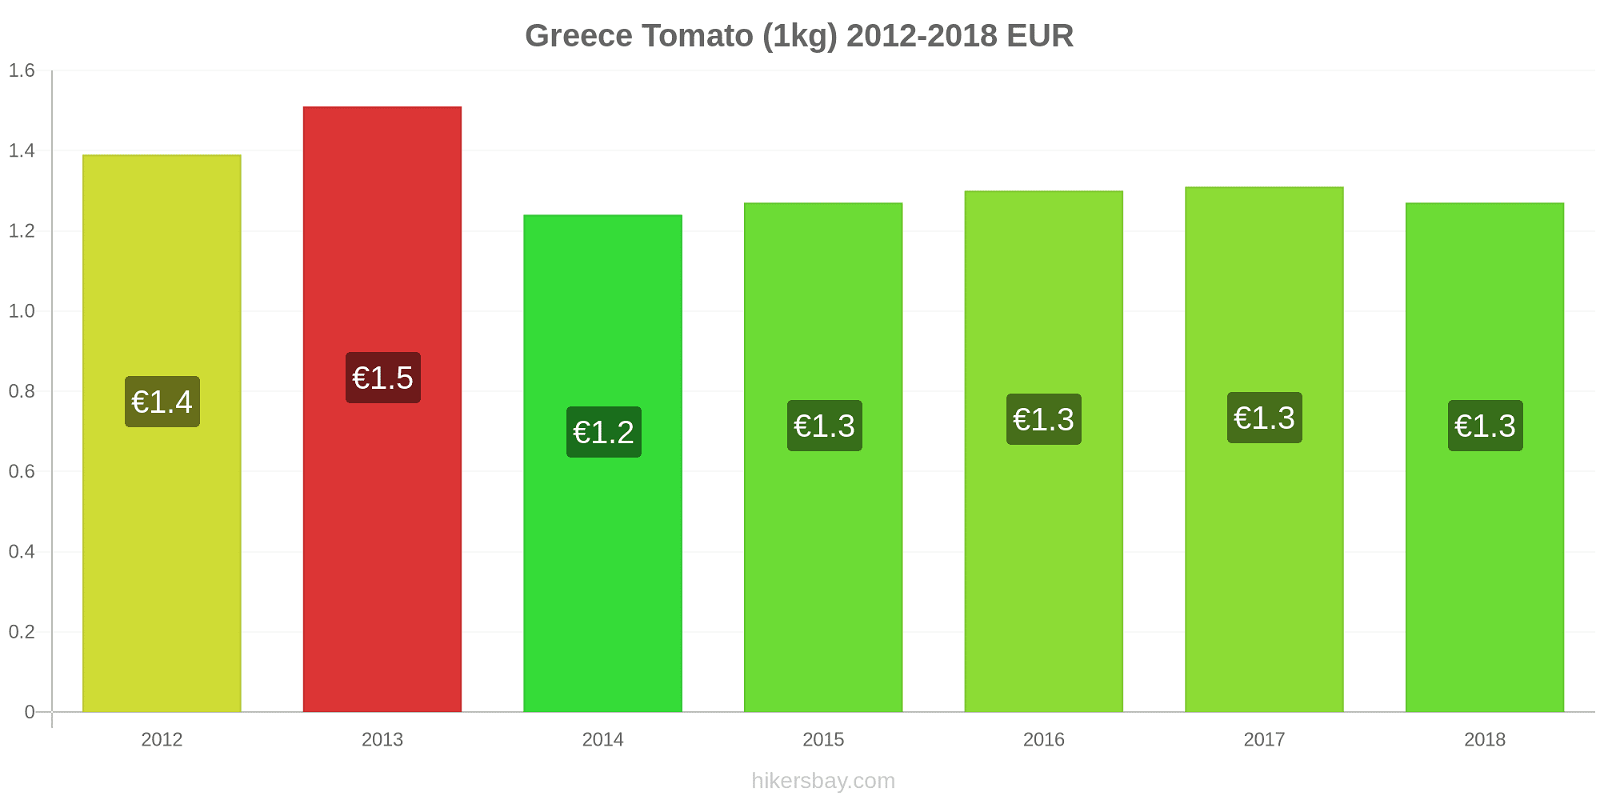 Greece price changes Tomato (1kg) hikersbay.com